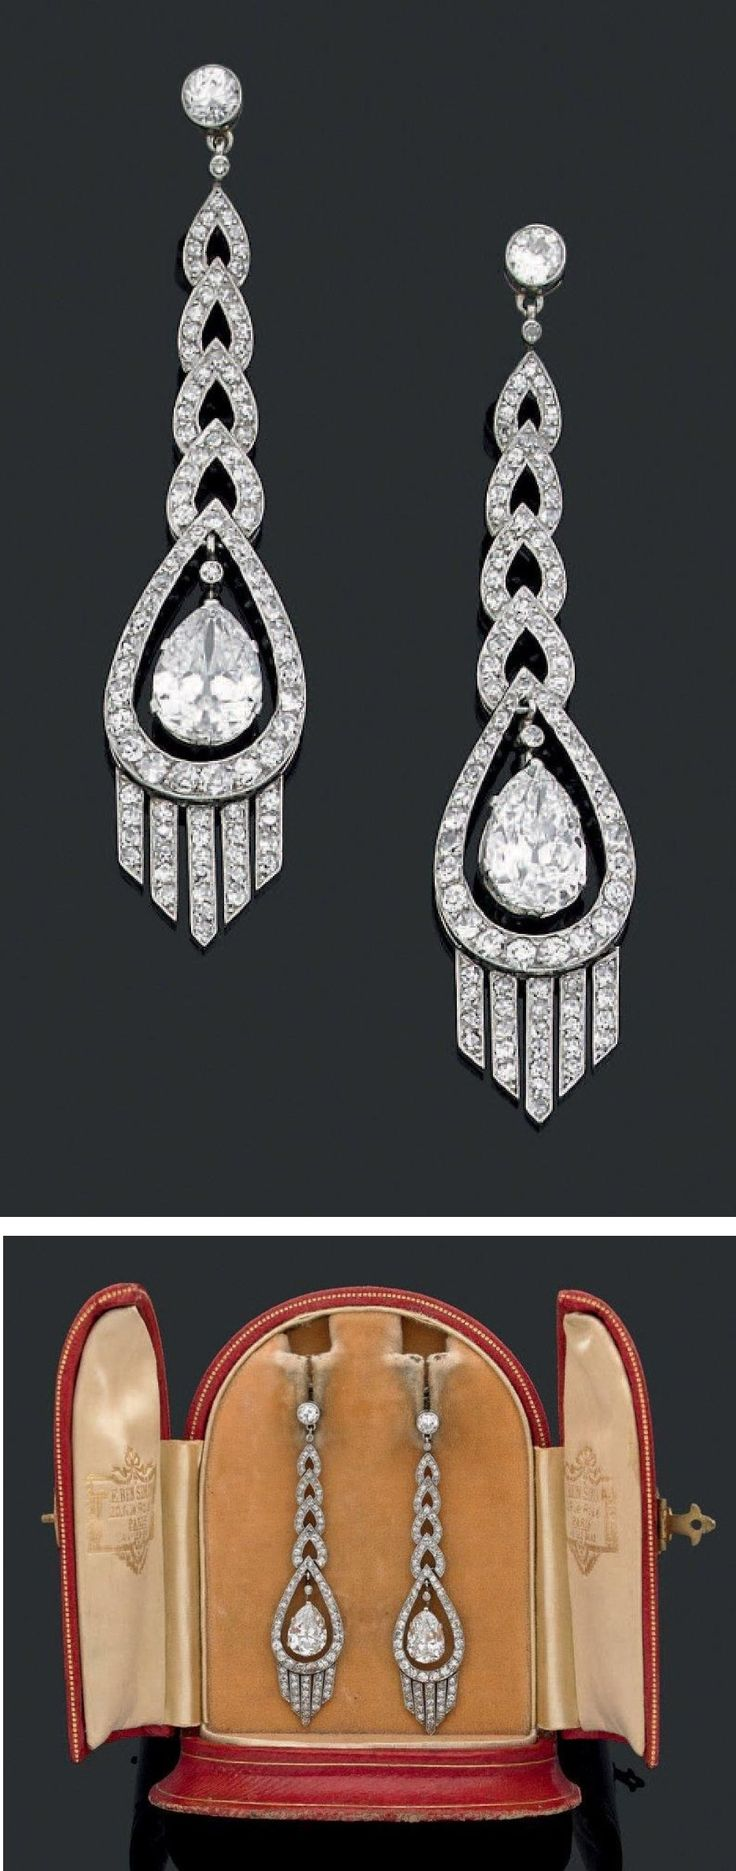 An elegant pair of Art Deco platinum, white gold and diamond earrings, about 1920. Length 6.3cm. #ArtDeco #earrings